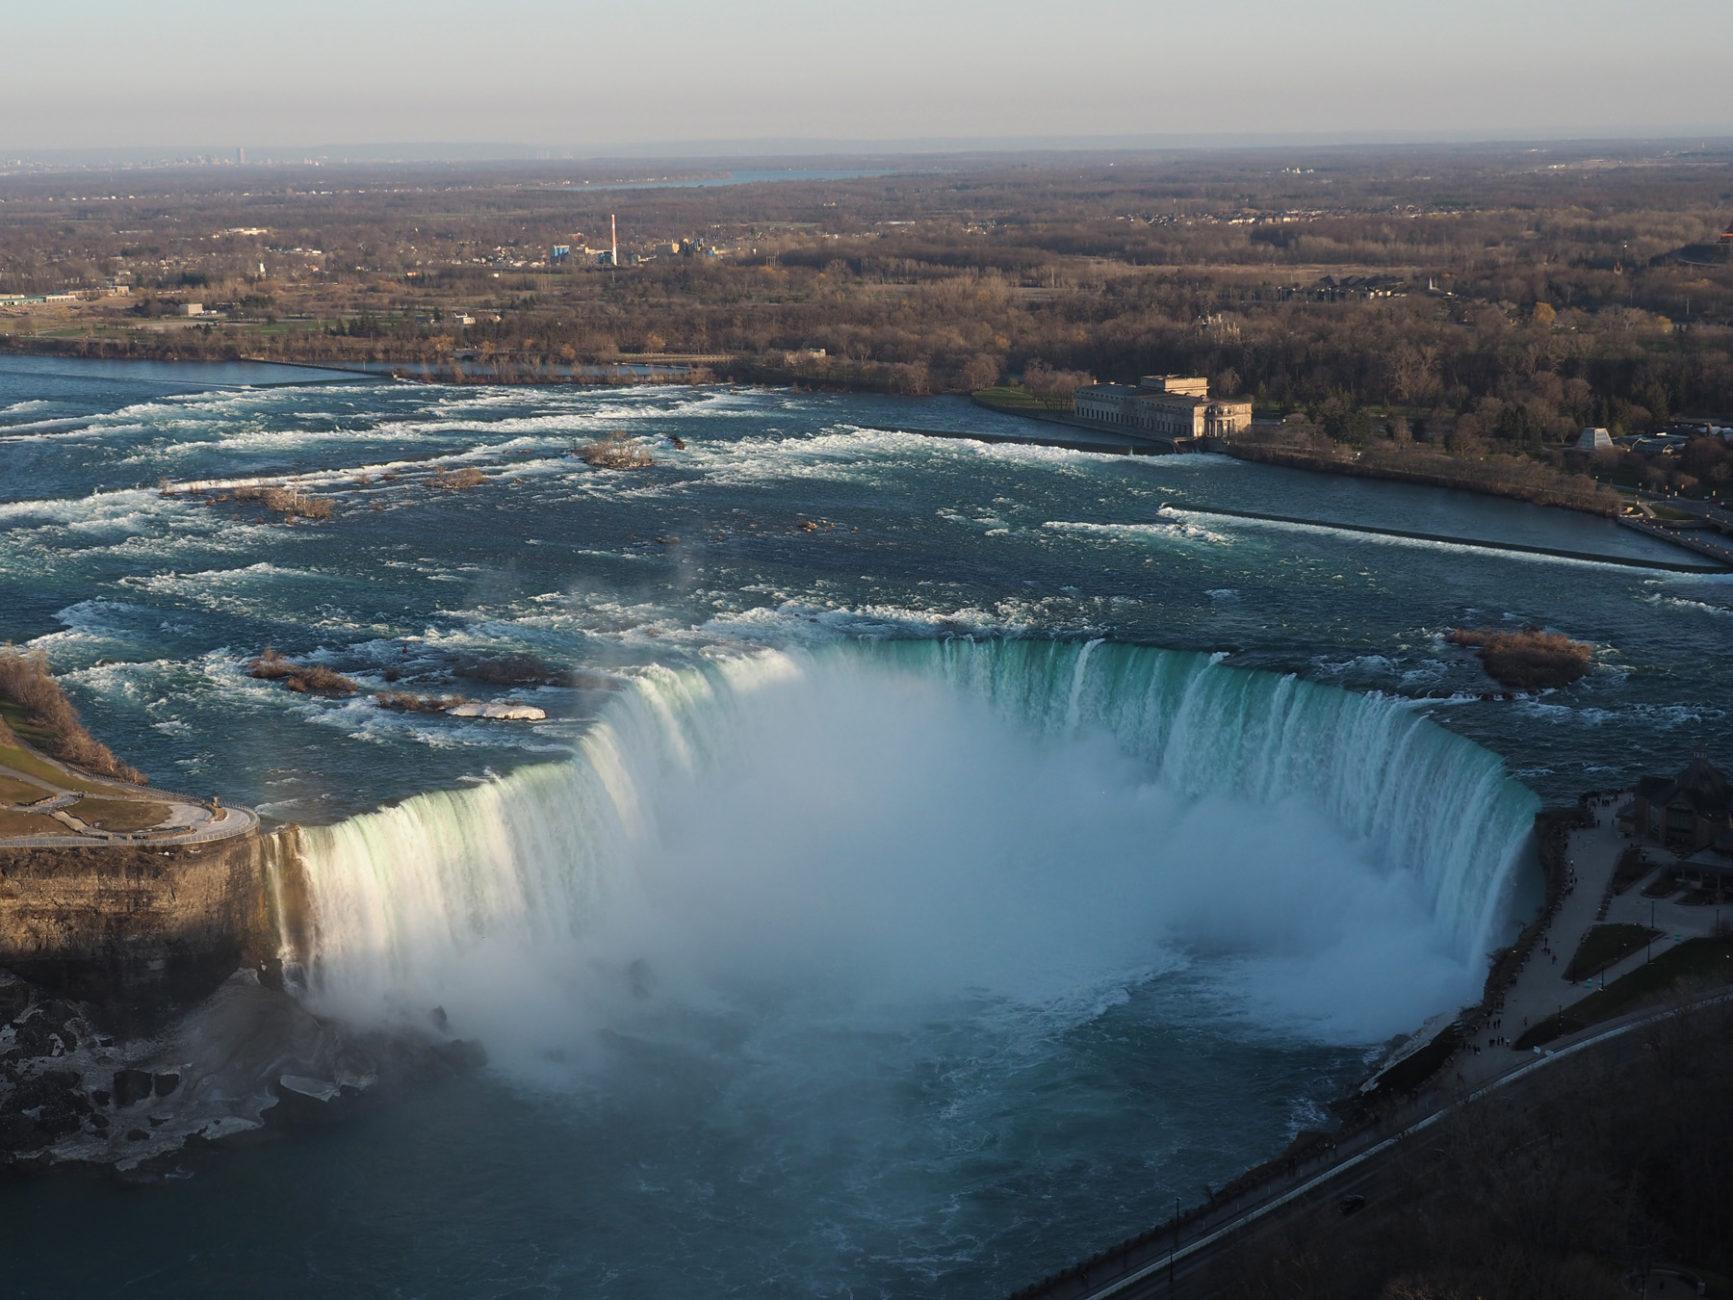 Niagara Falls, kanadische Seite